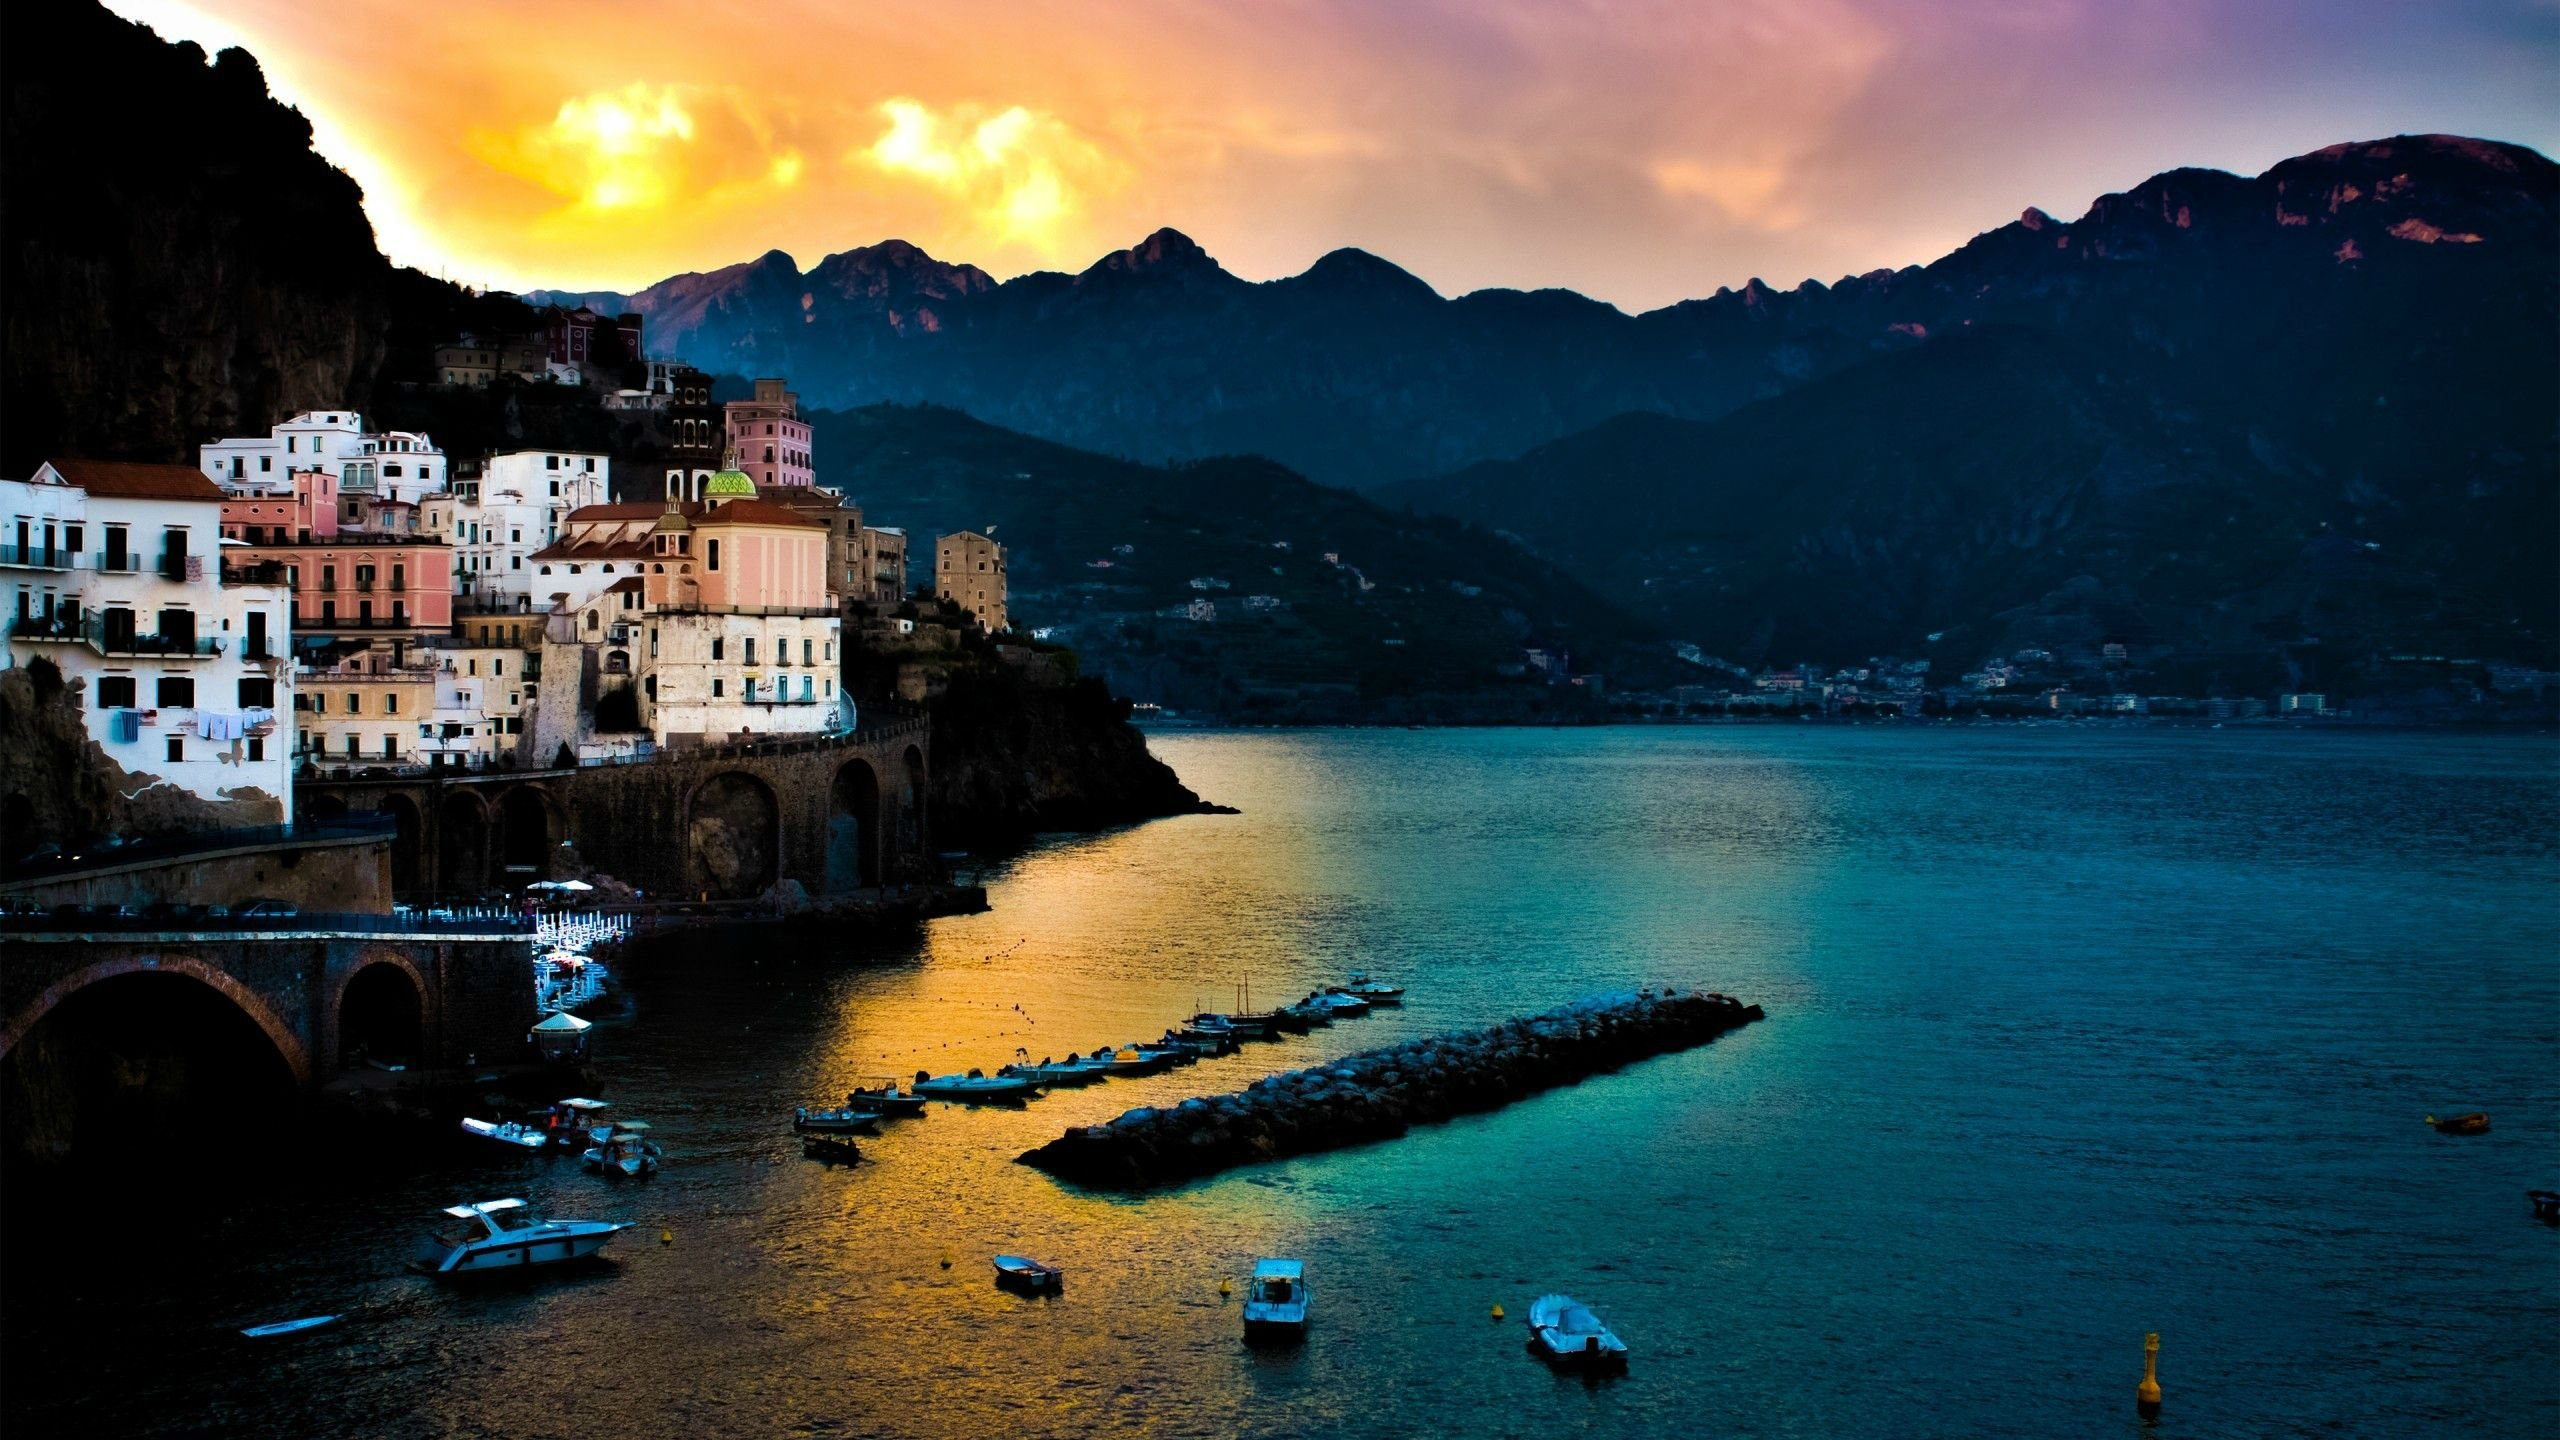 Black Wallpaper Galaxy S4 Amalfi Coast Landscape Hd Wallpaper